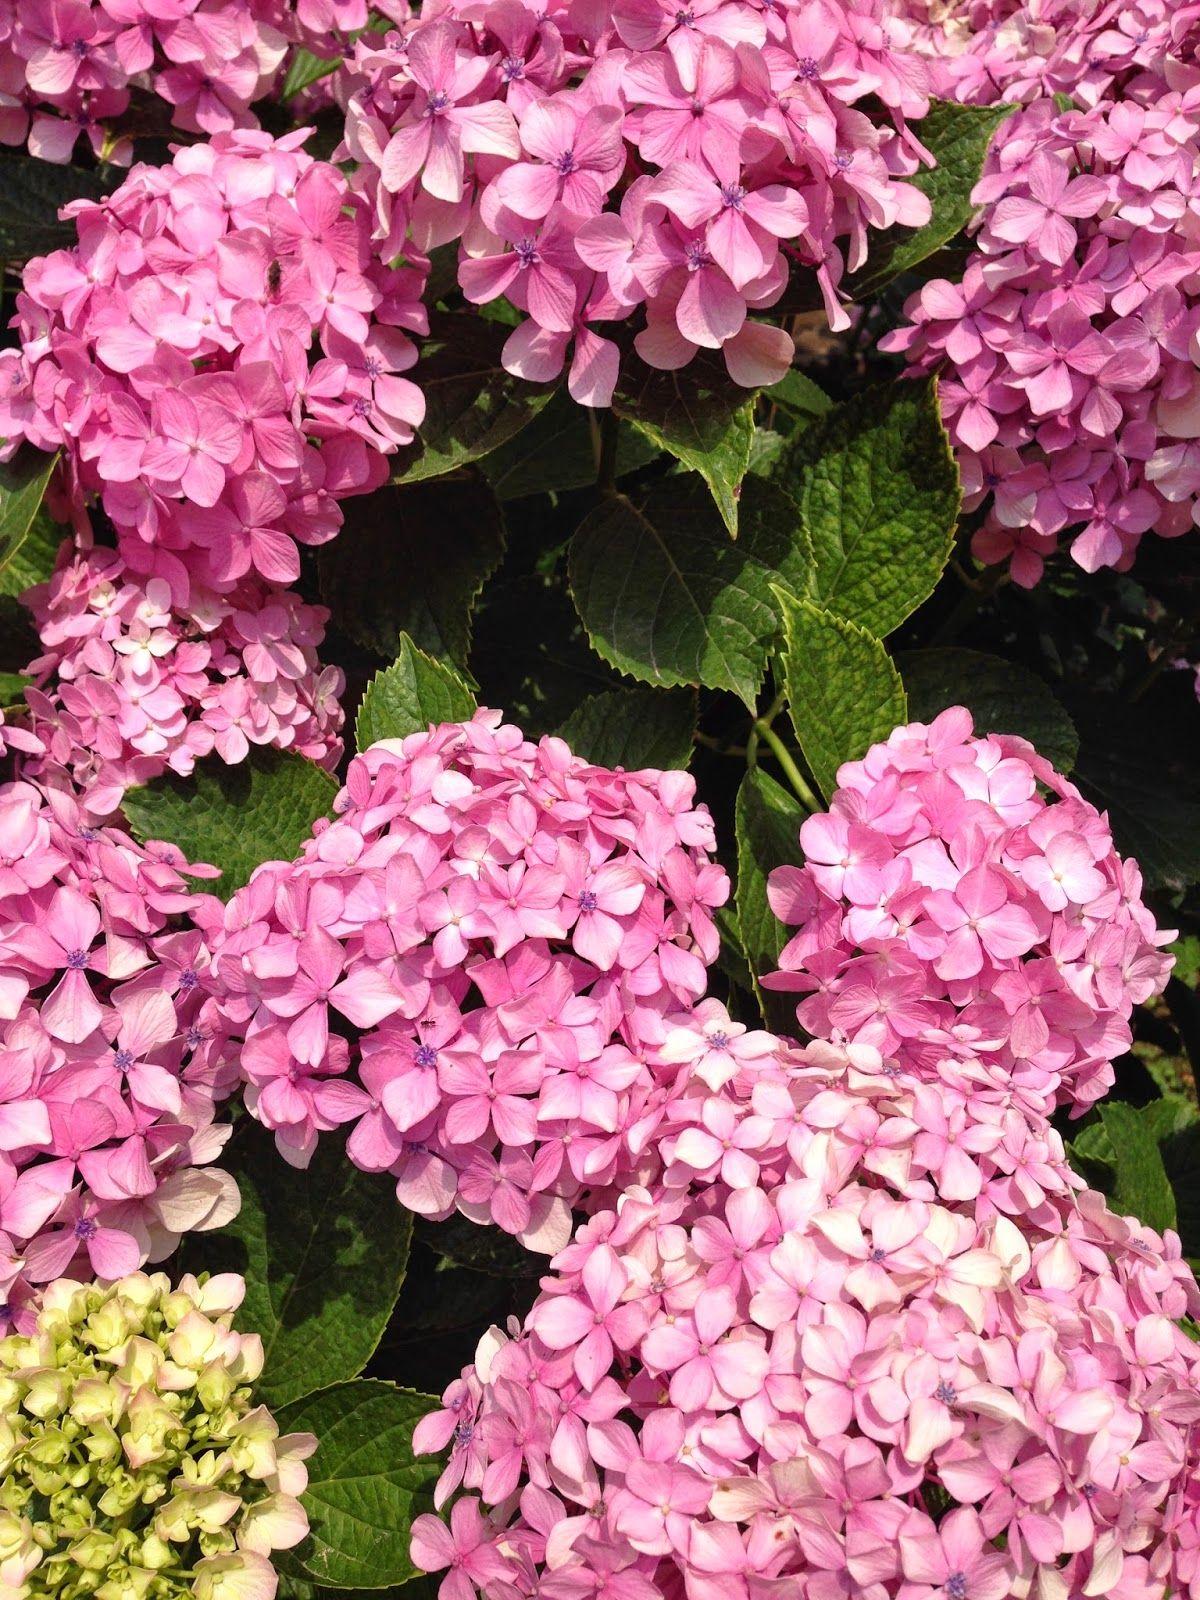 Asya Store Summer Hydrangea Summer Hydrangeas Hydrangea Flowers